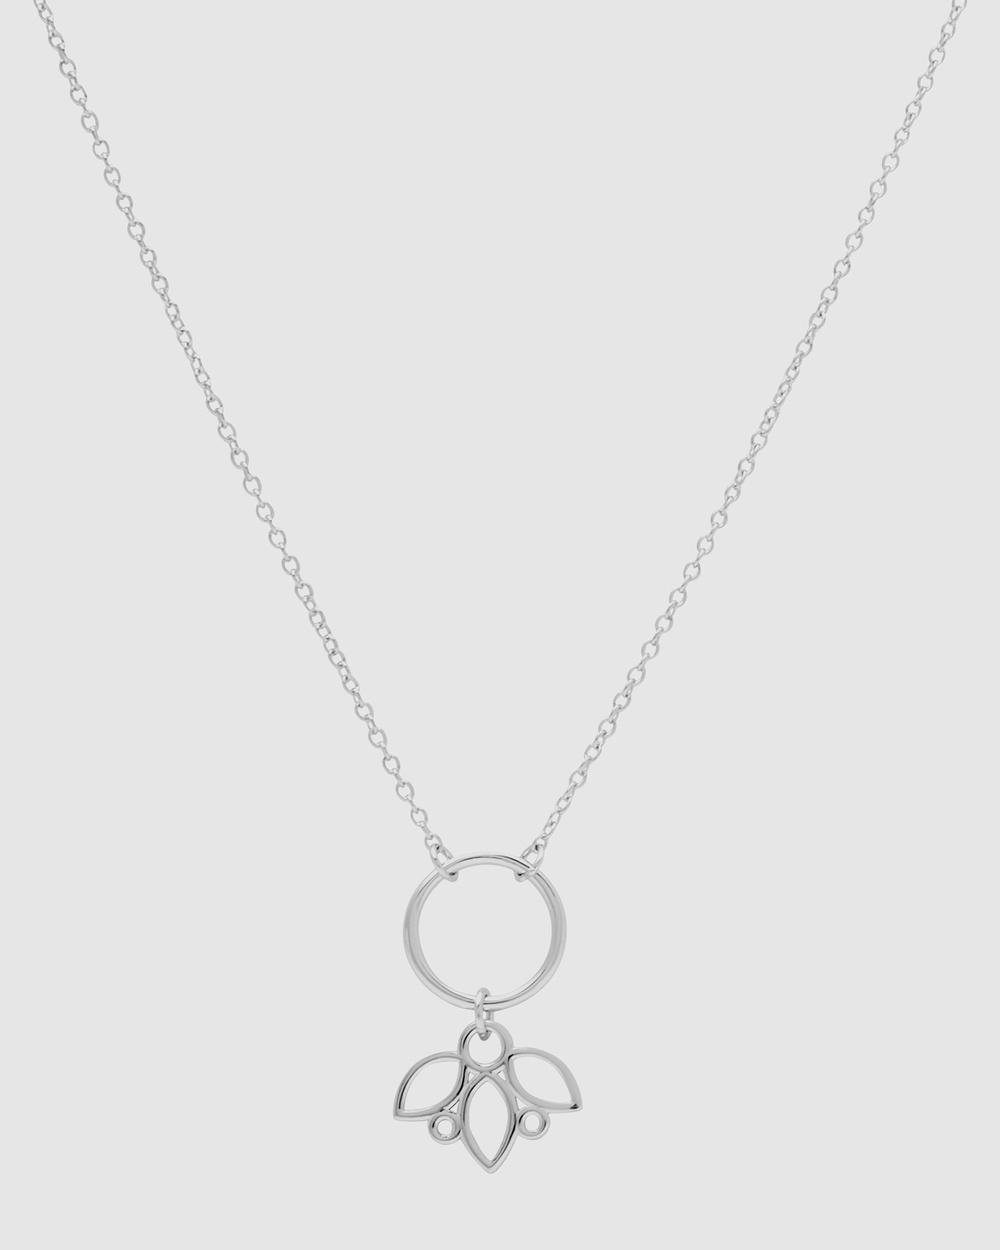 Pastiche Posy Necklace Jewellery Silver